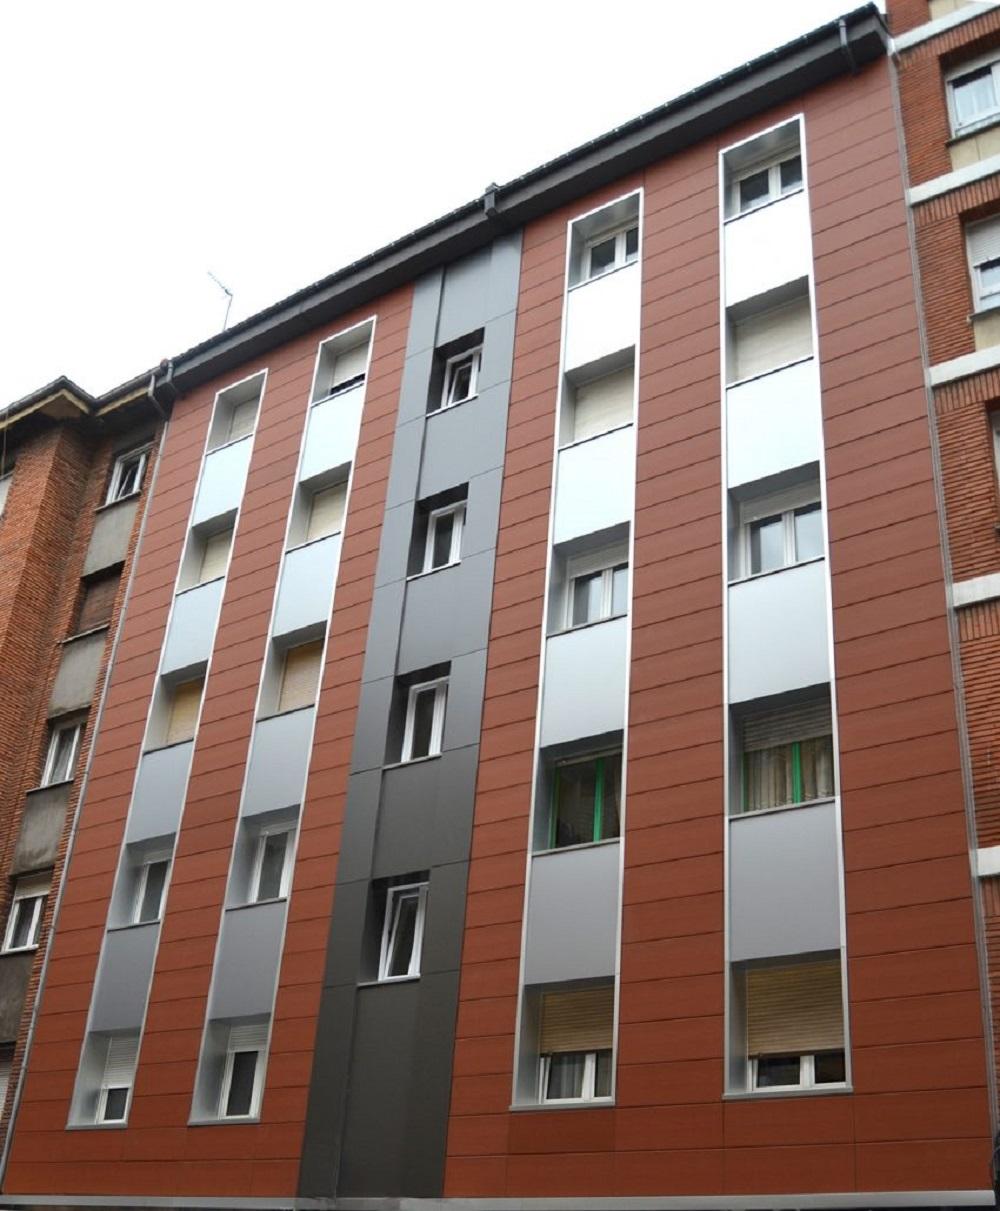 rehabilitacion de fachadas en Vitoria reforma de fachadas y arreglo de fachadas en Vitoria